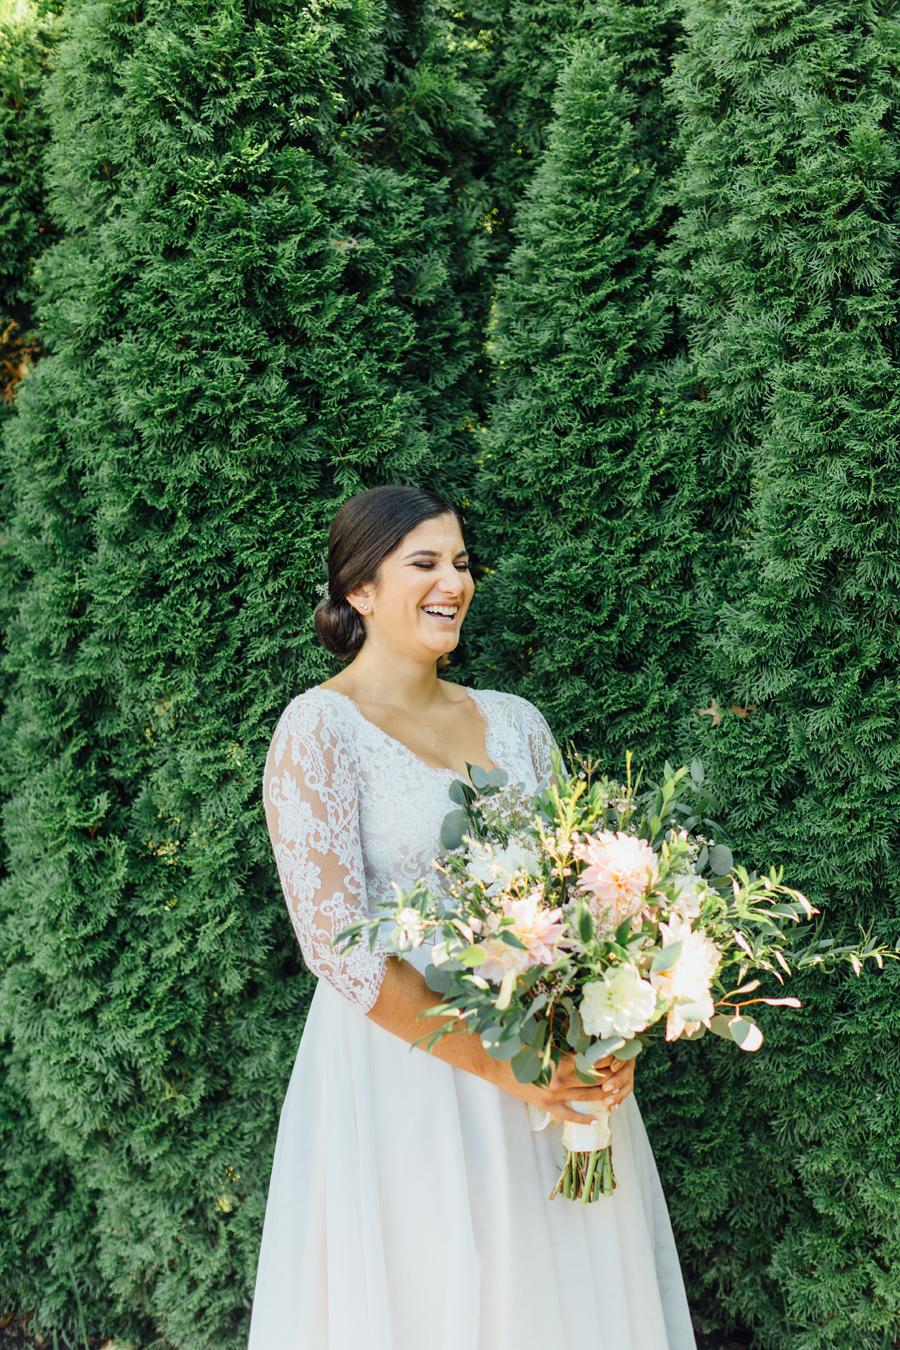 the-inn-at-leola-wedding-lancaster-pennsylvania-wedding-photographer-rebeka-viola-photograhy (35).jpg